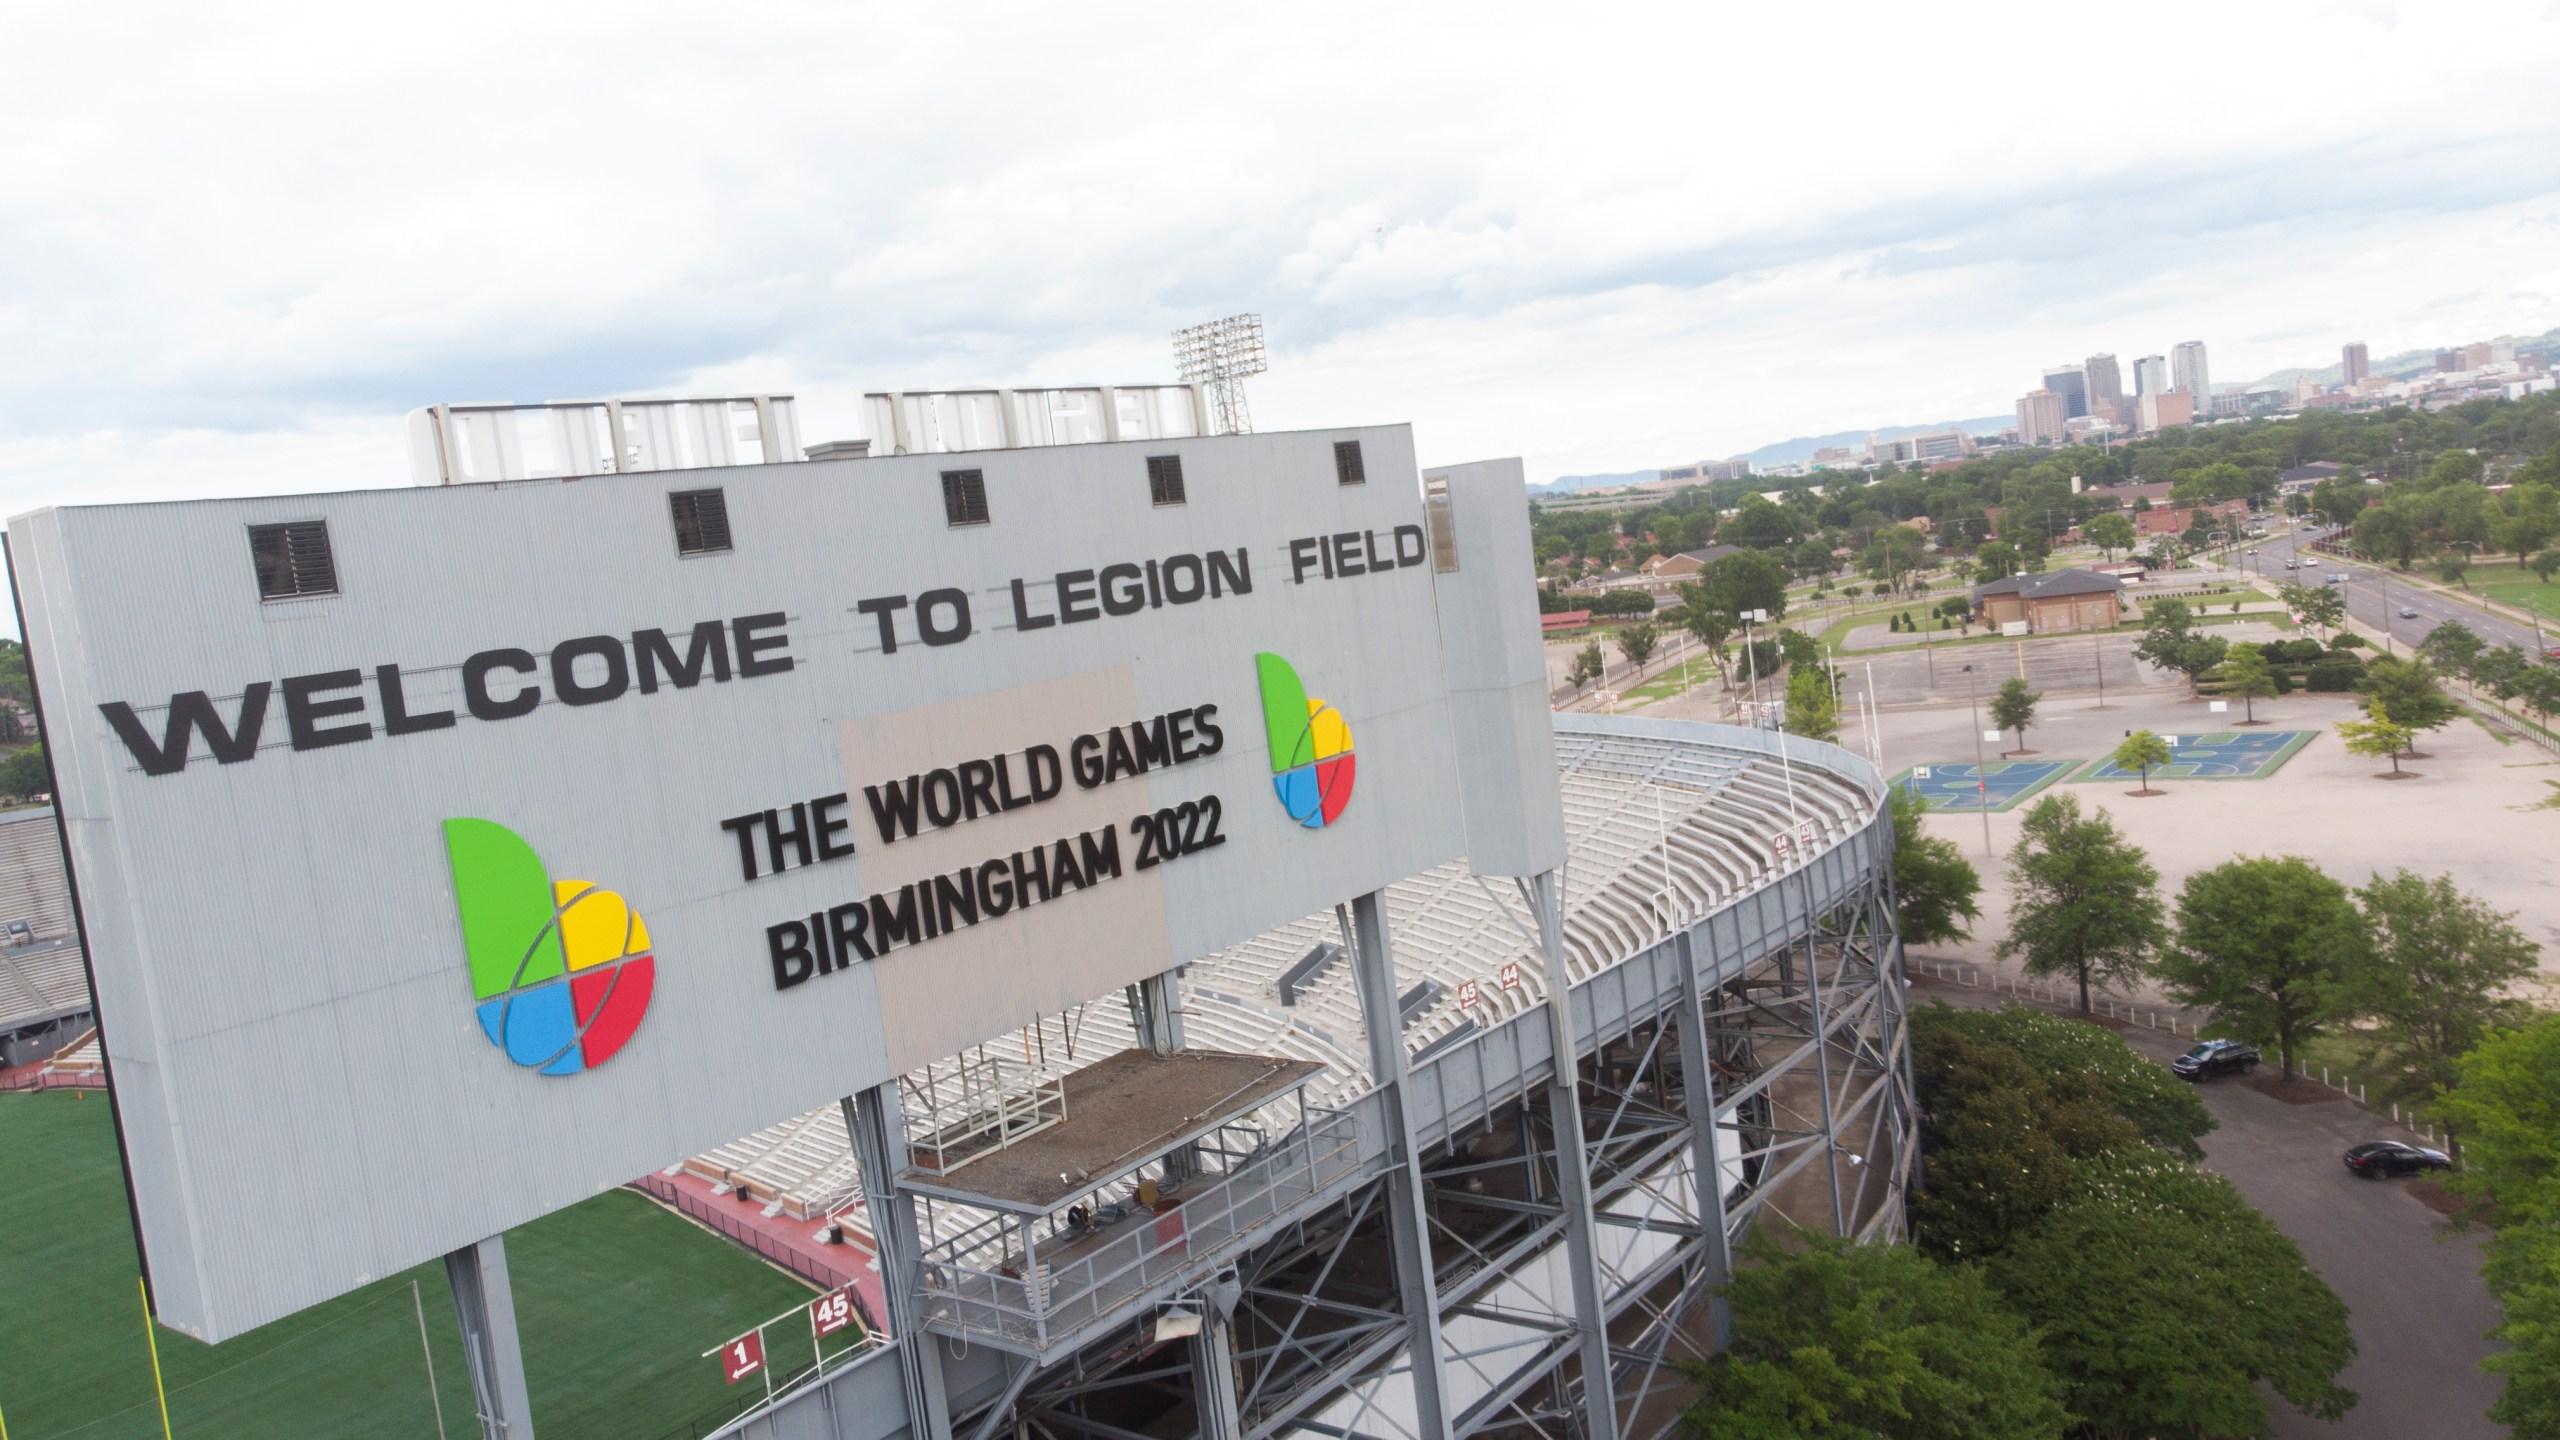 World Games at Legion Field